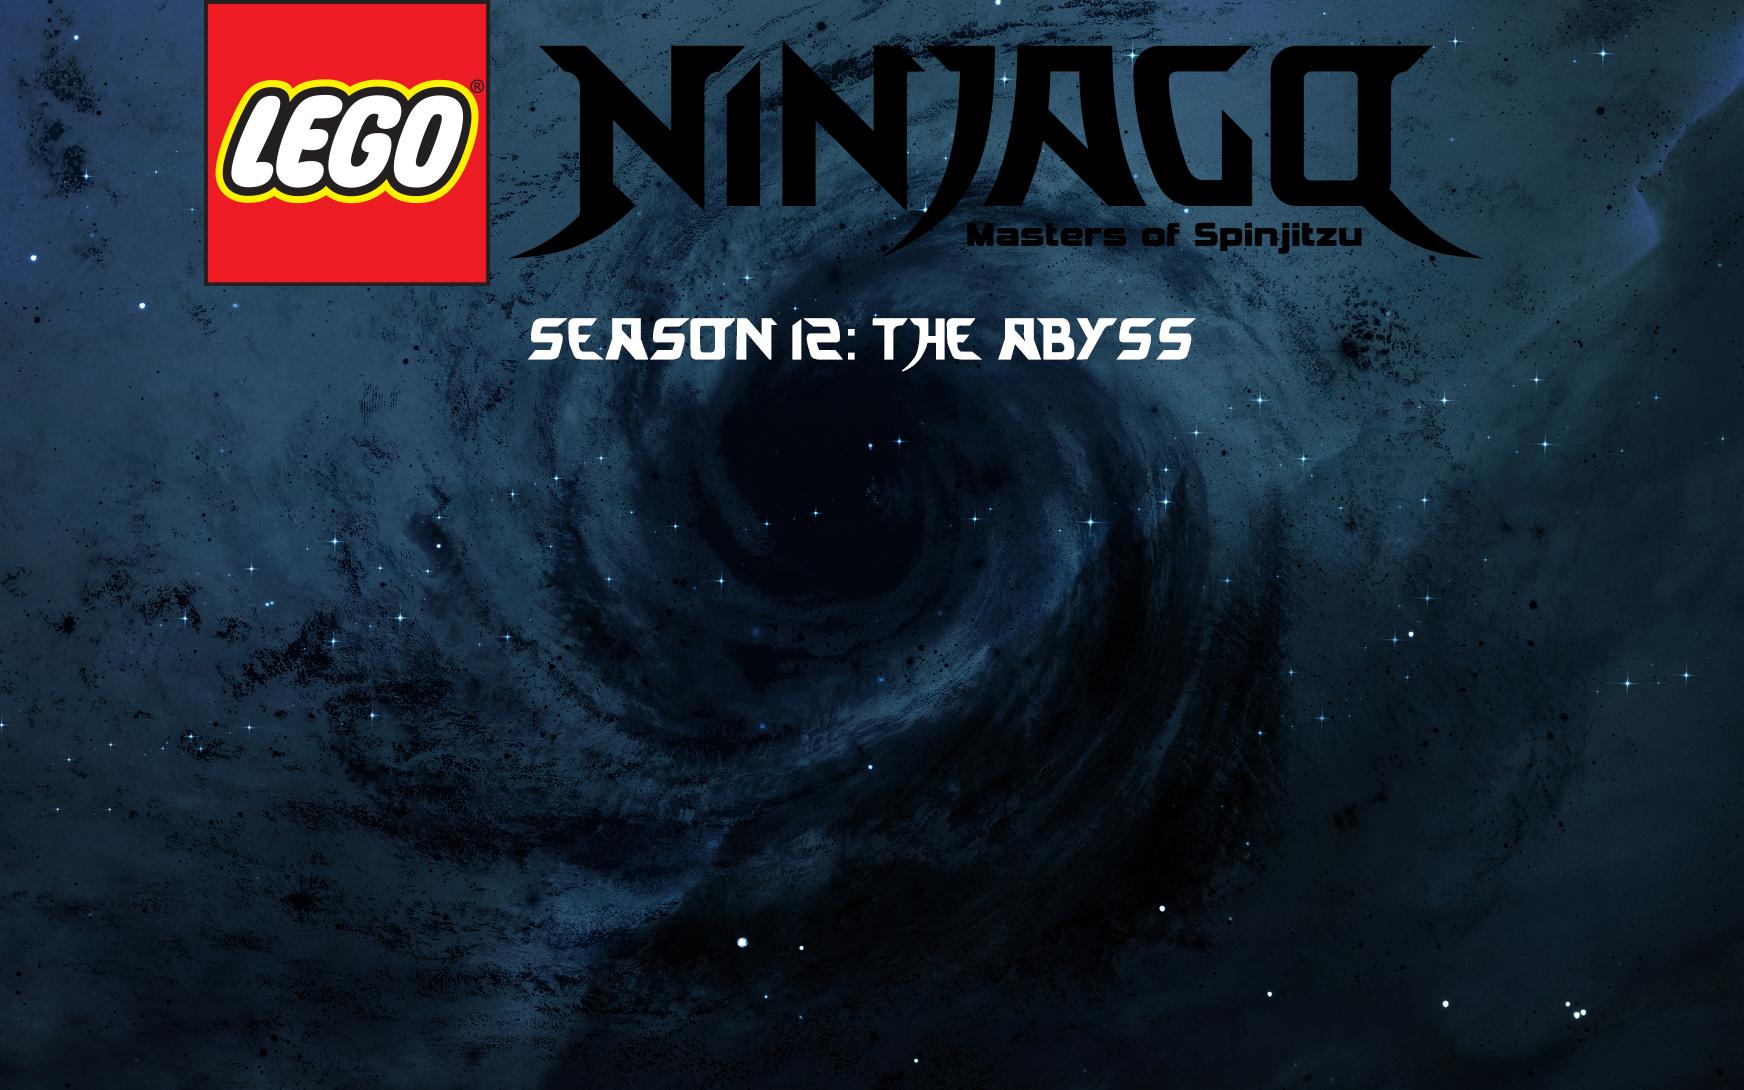 Season 12 The Abyss Ninjago Fanon Wiki Fandom